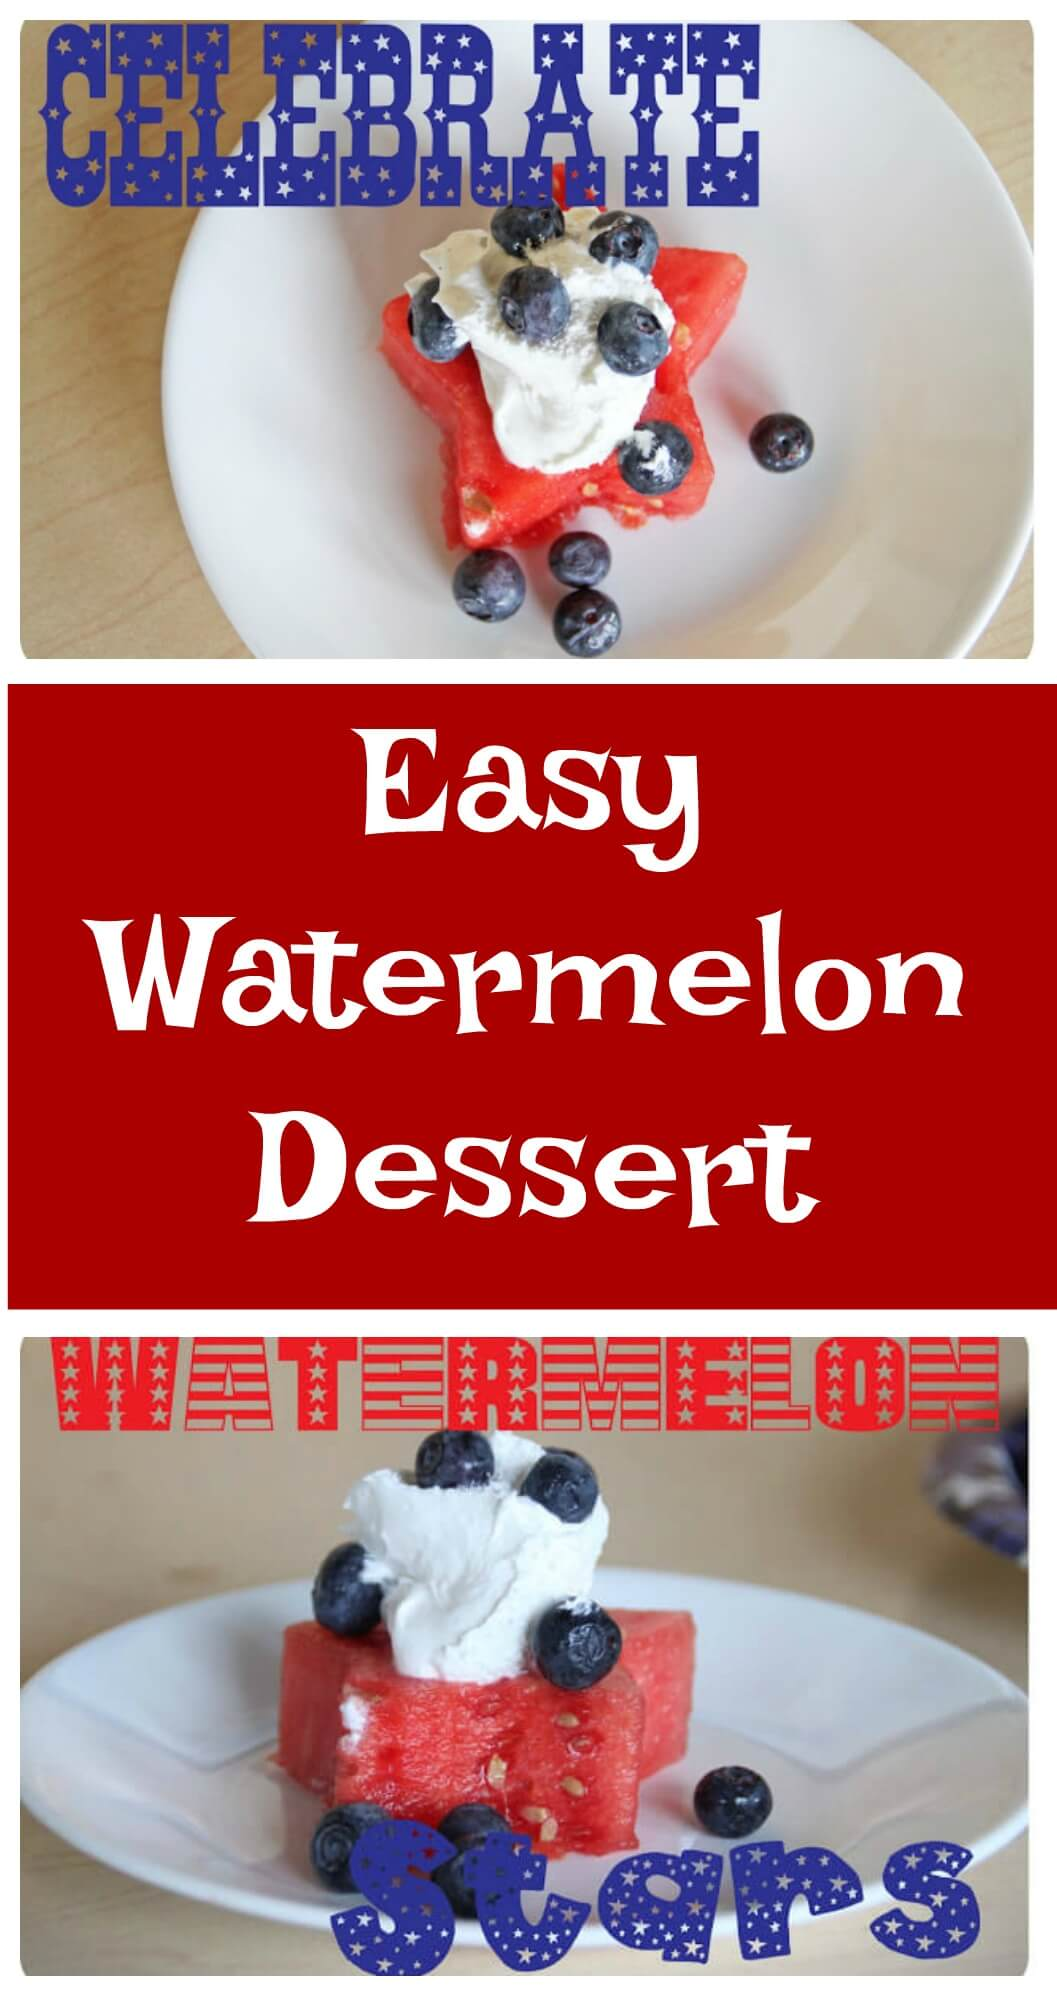 Easy Watermelon Dessert Stars from Life Sew Savory